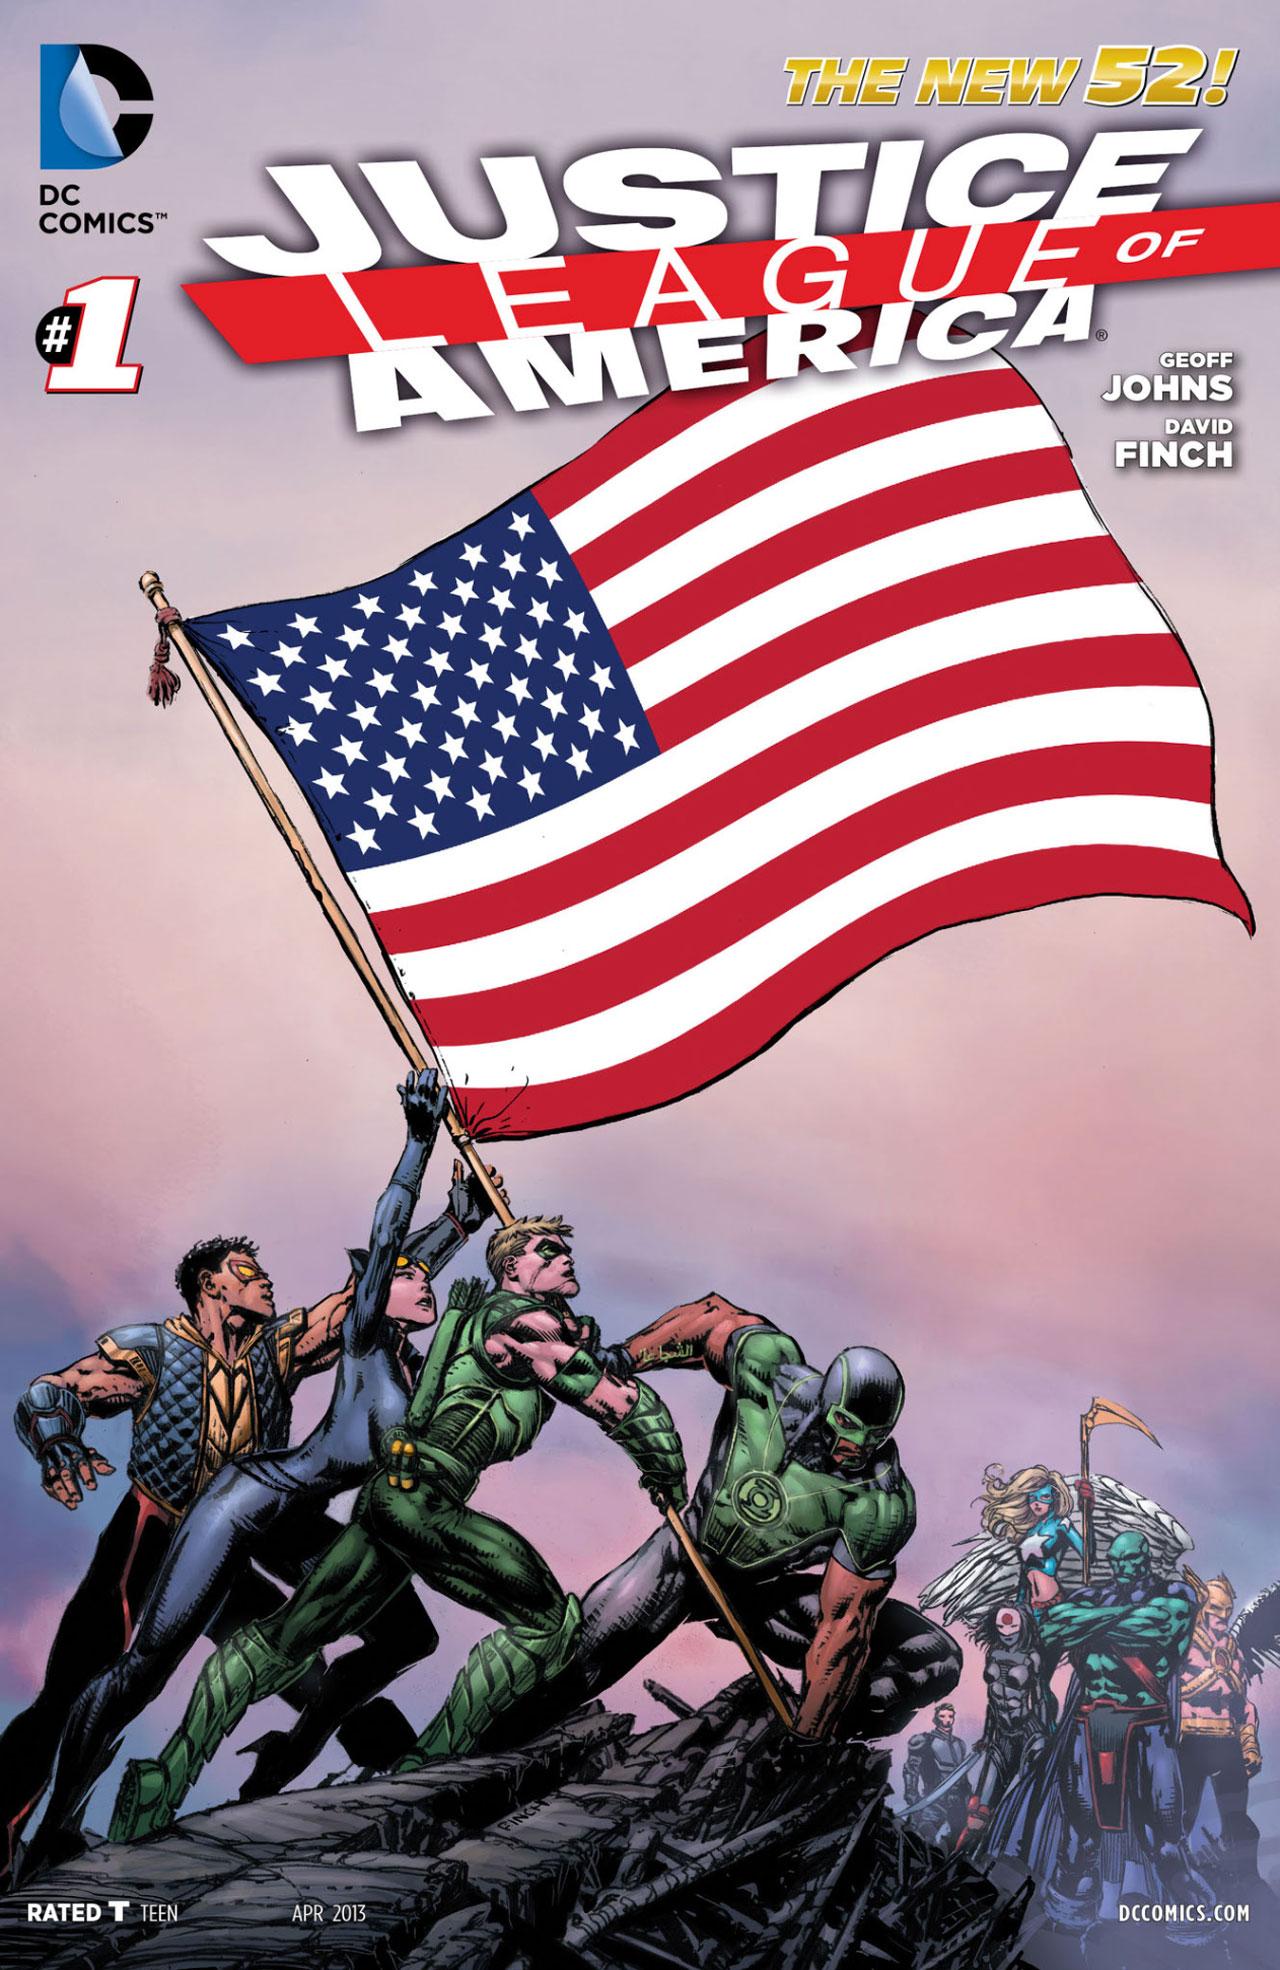 Justice-League-of-America-1.jpg